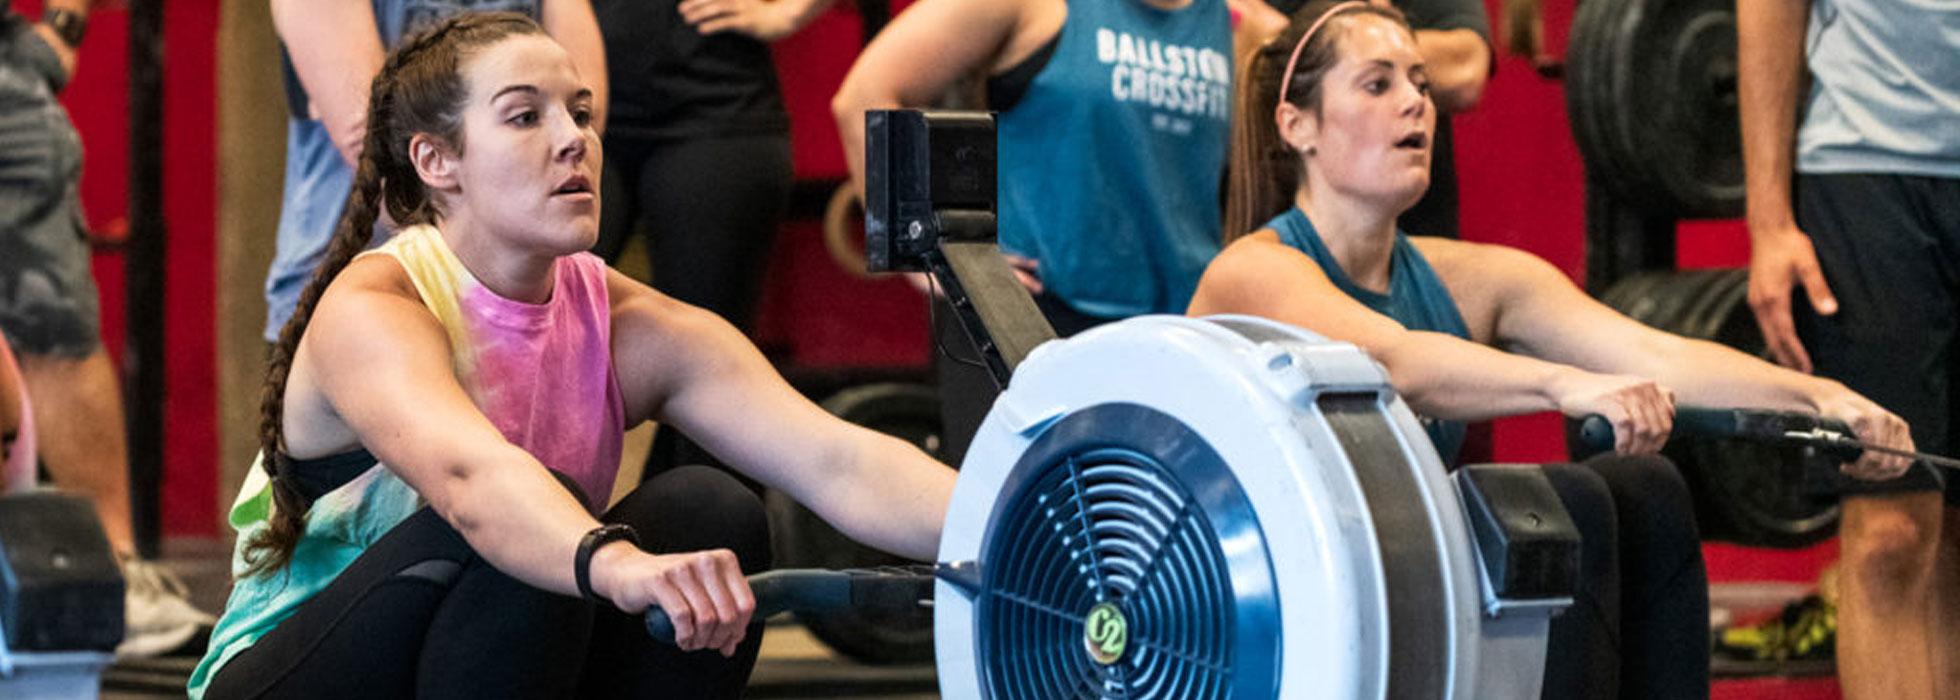 CrossFit Group Fitness Classes Near Me In Arlington, Virginia